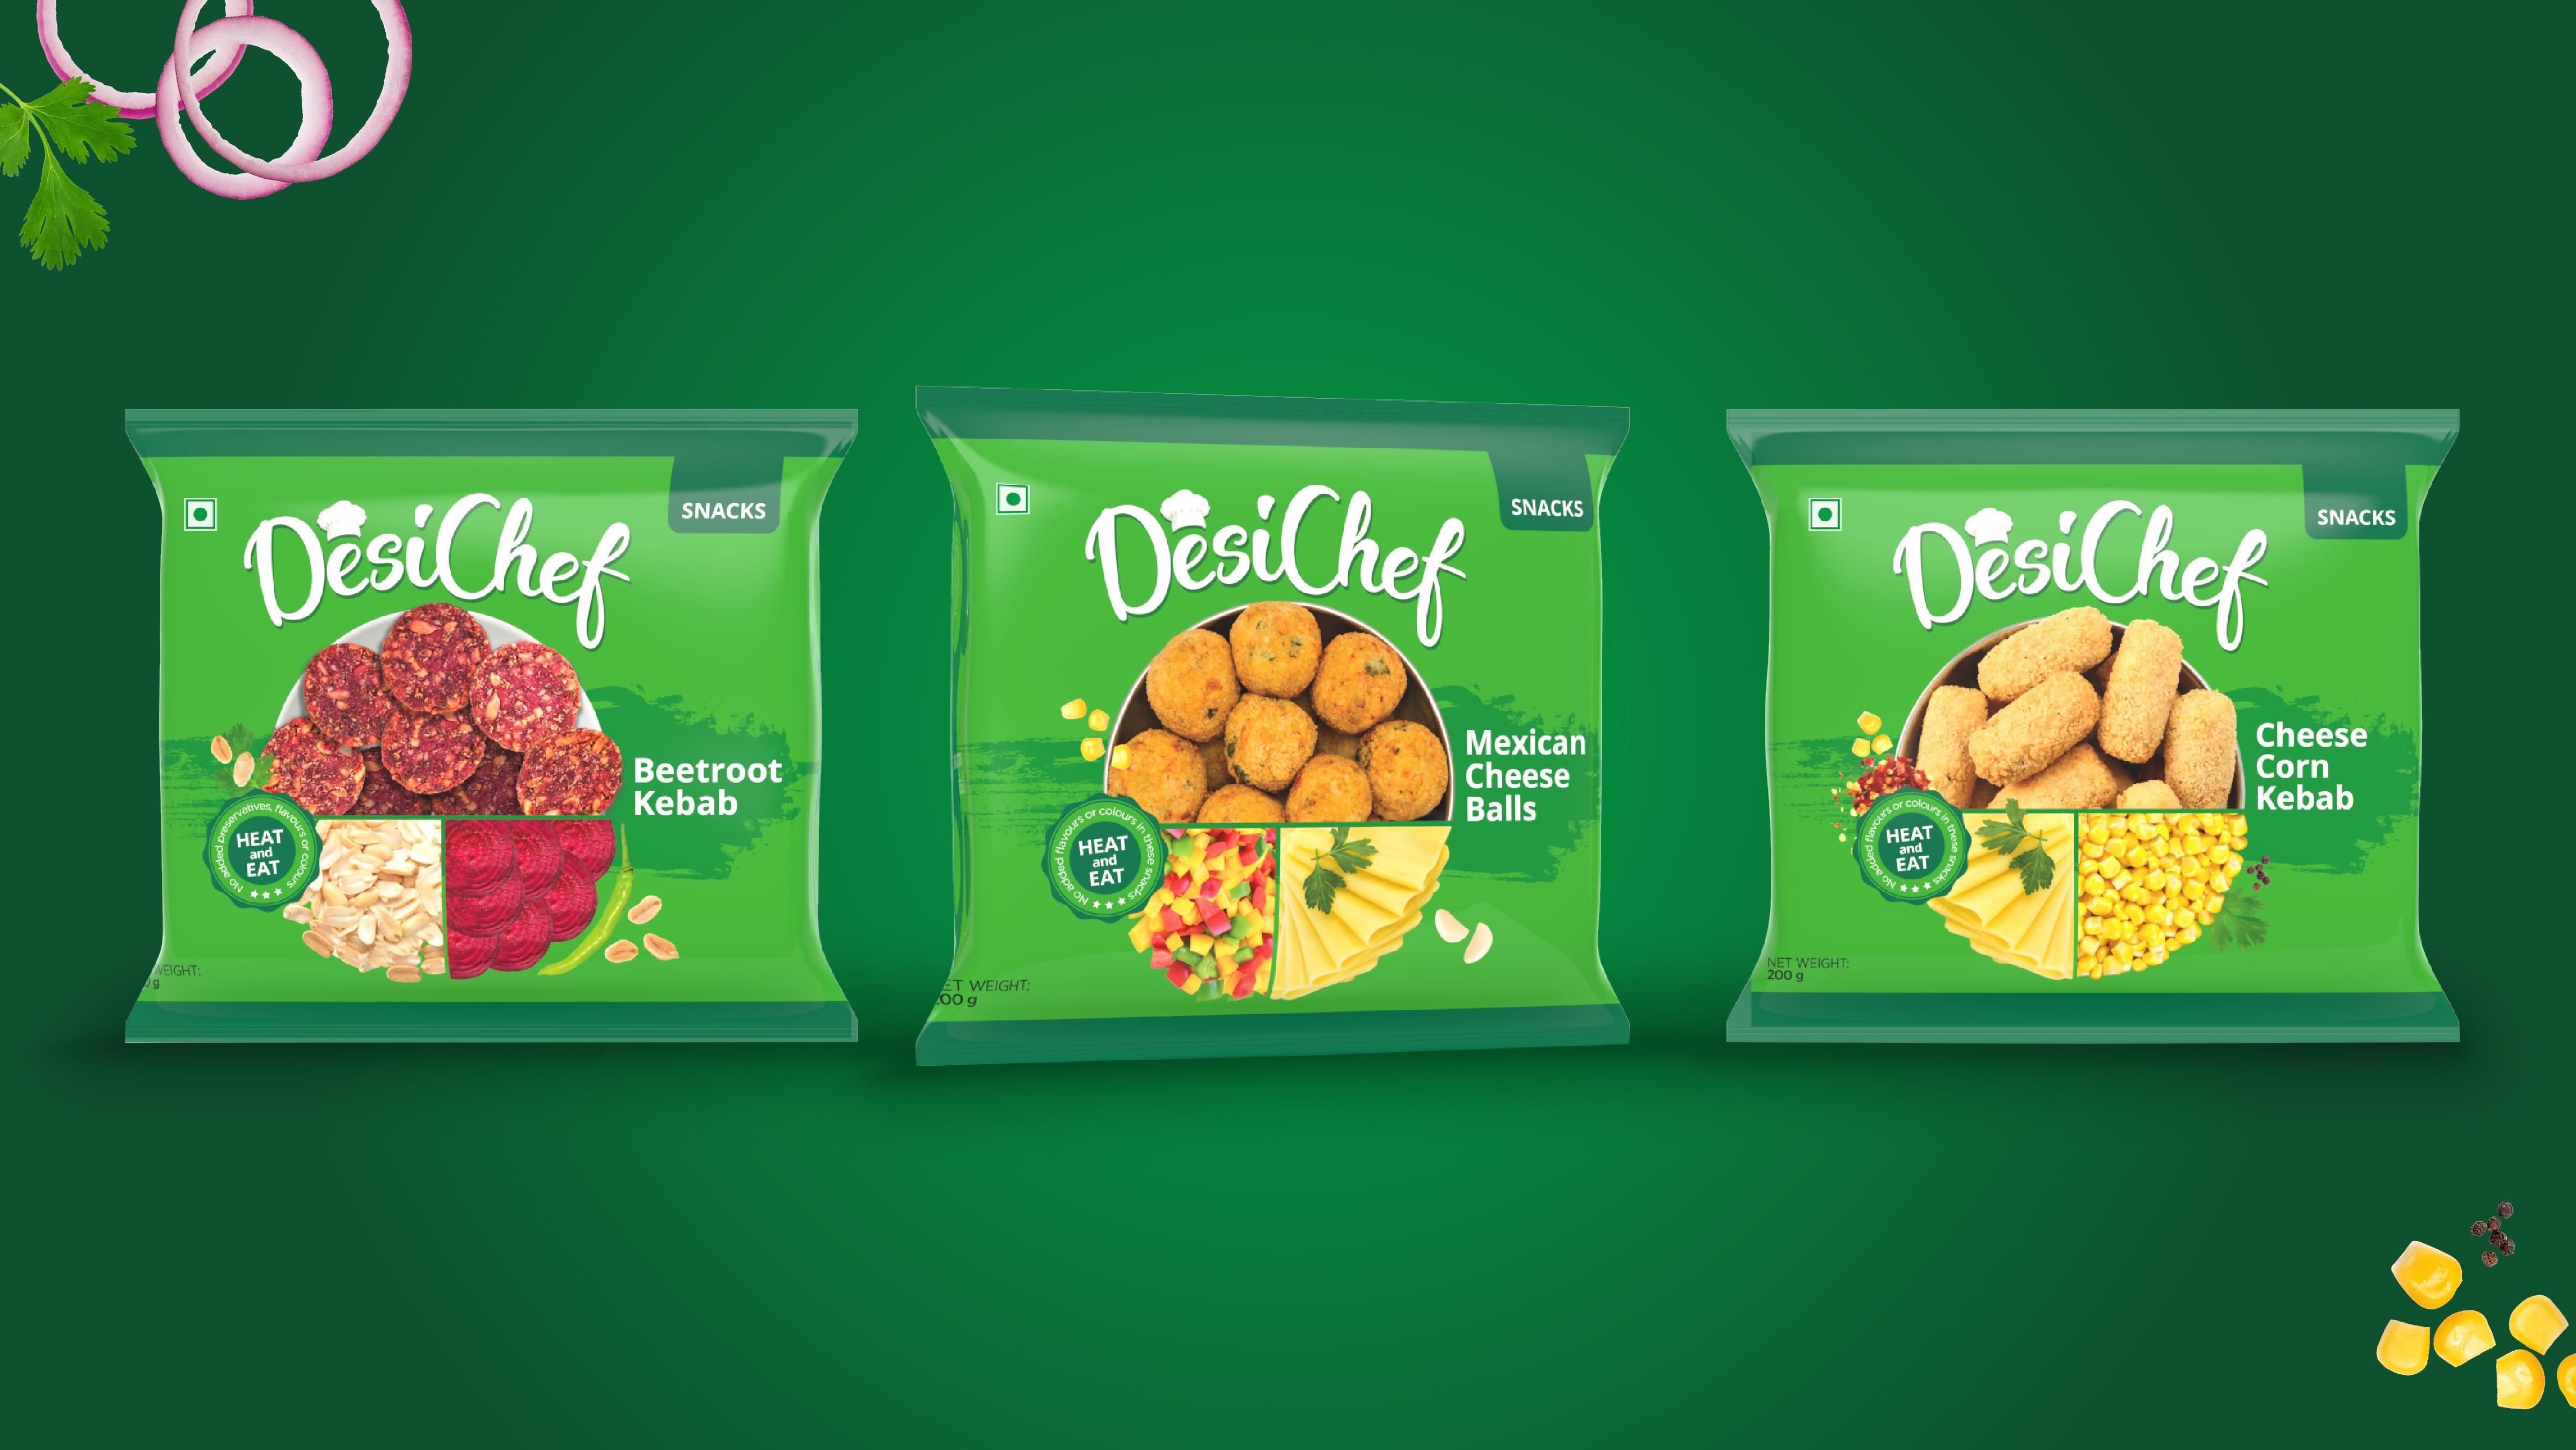 Brand & Packaging Design for Desi Chef